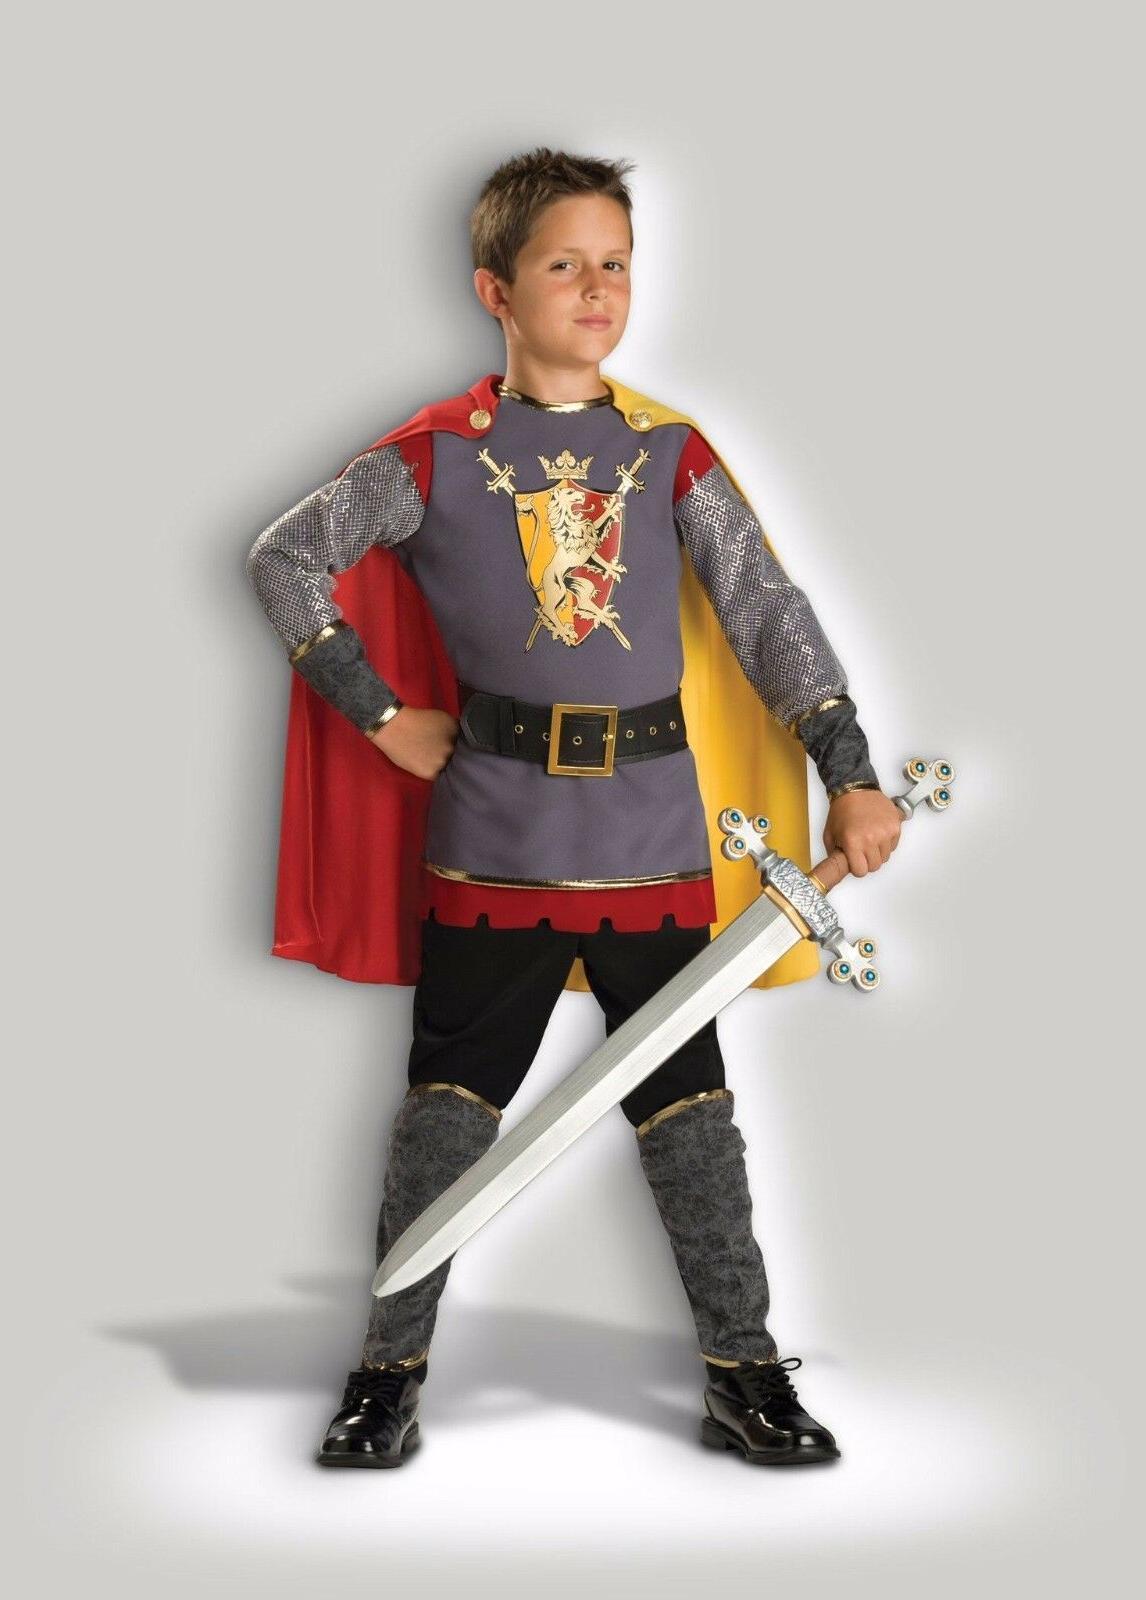 loyal knight medieval warrior child boys halloween